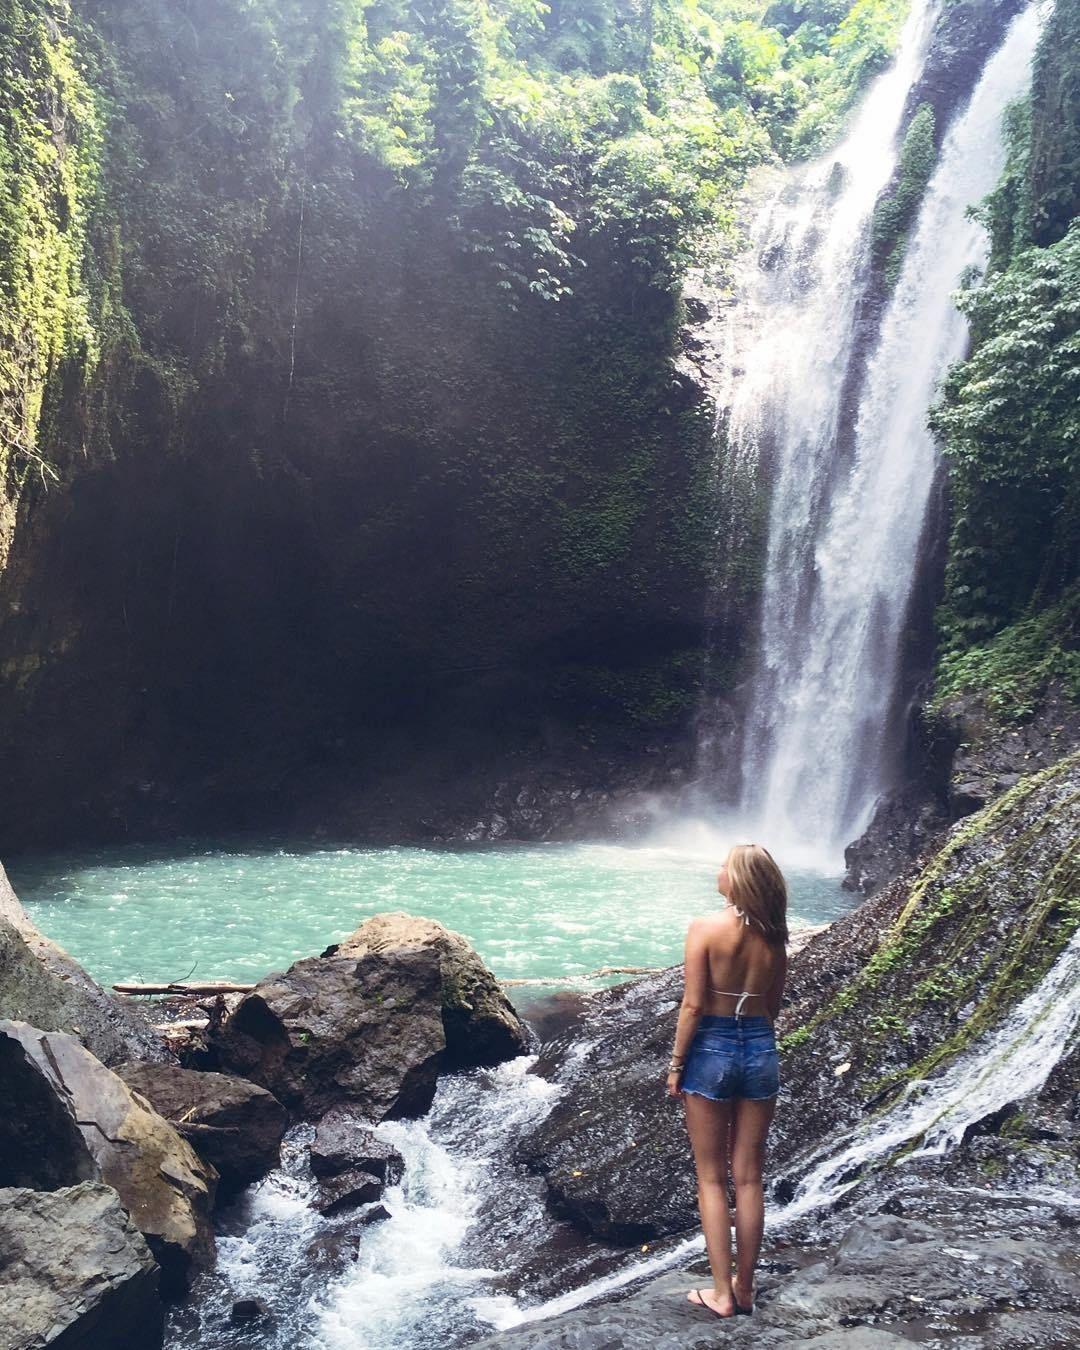 Bali Waterfalls, Waterfall, Bali